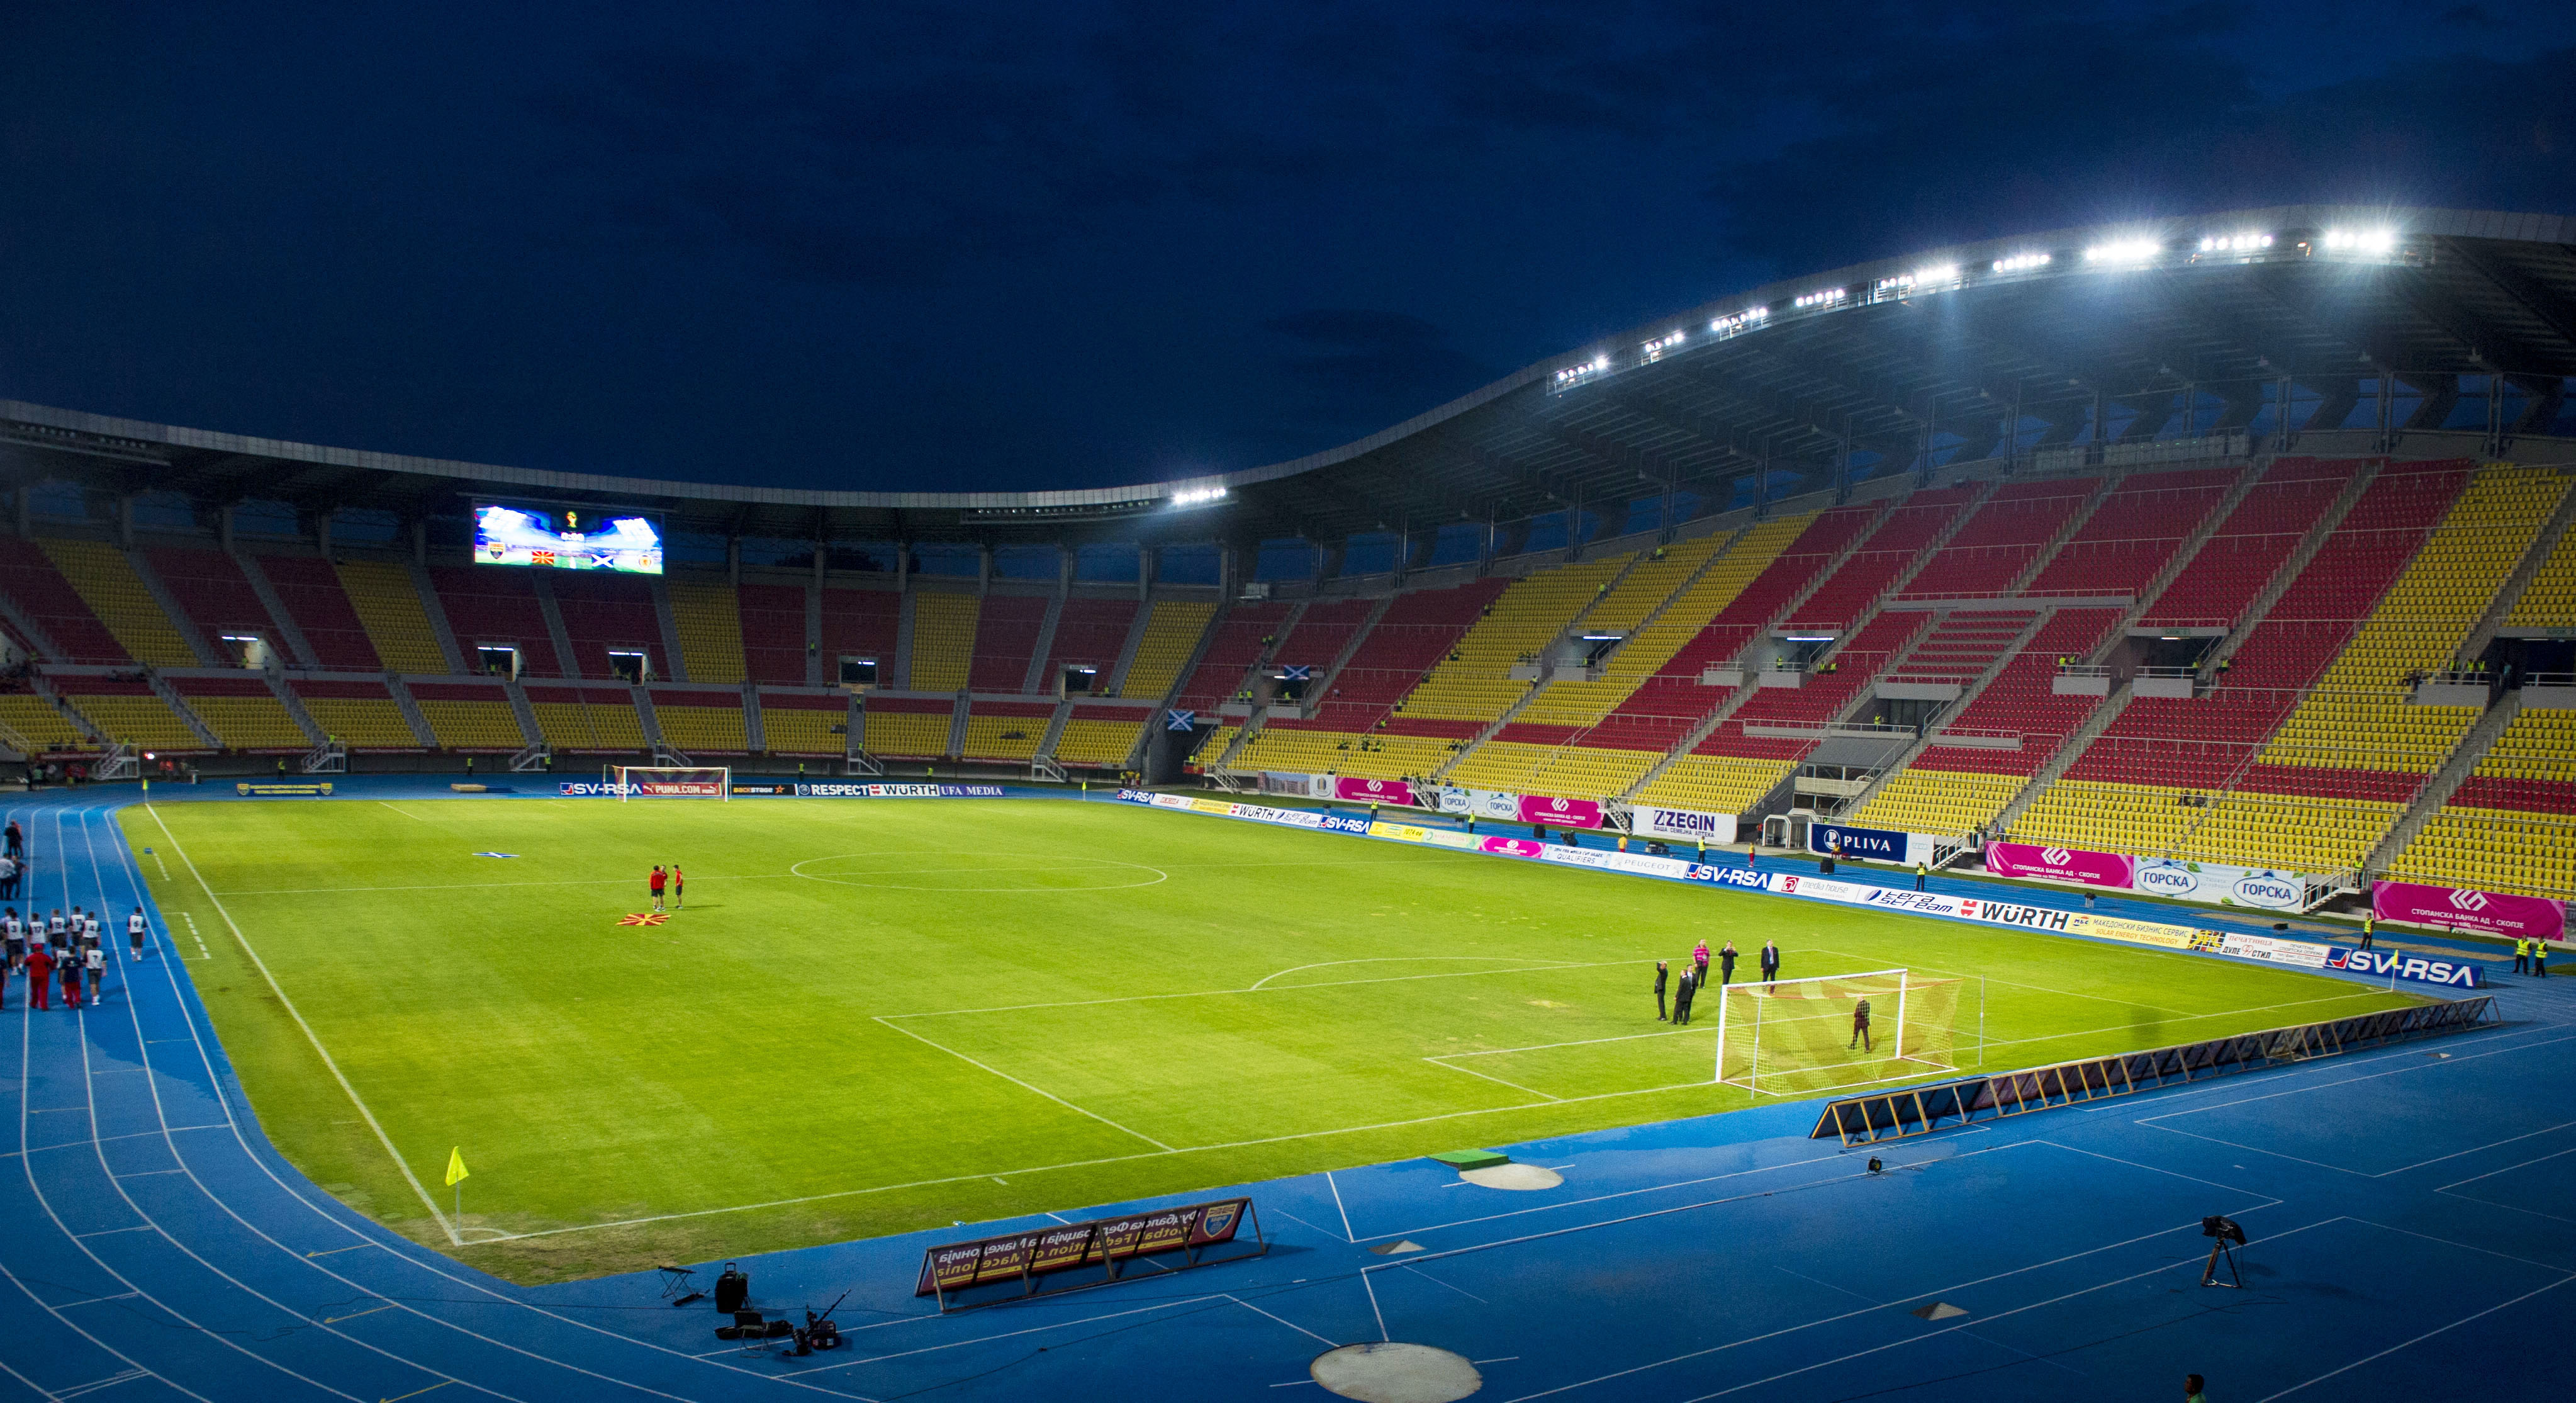 Vardar VS Zenit Petersburg ( BETTING TIPS, Match Preview & Expert Analysis )